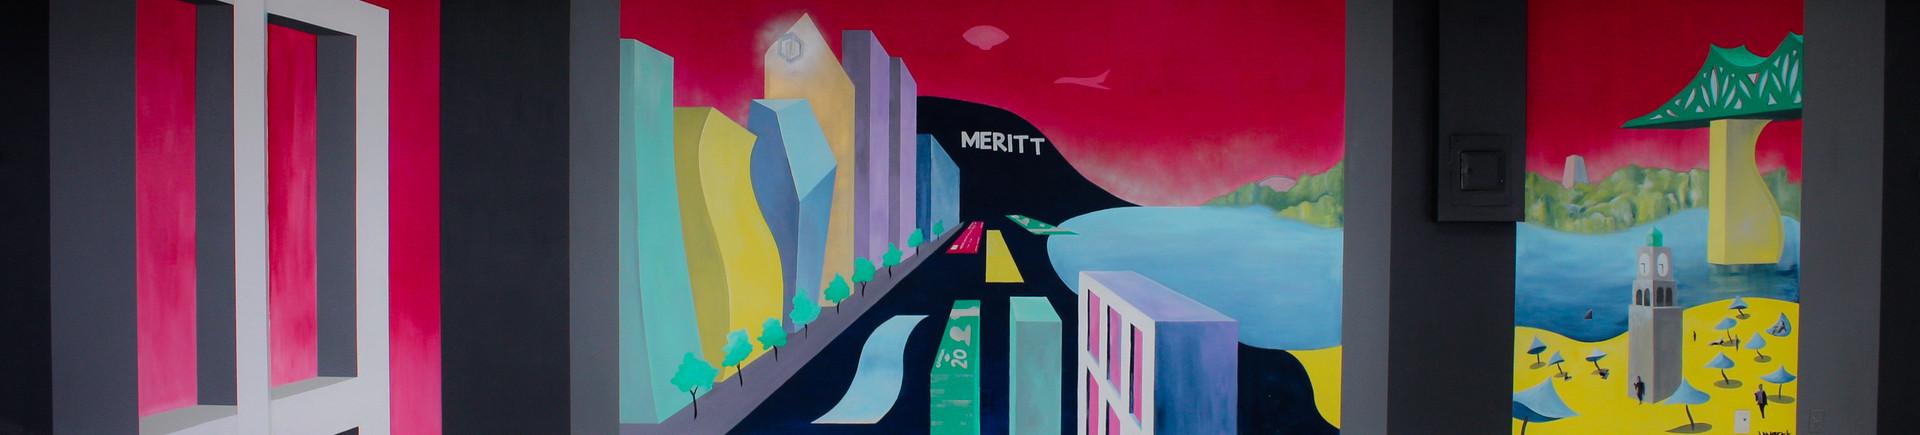 Meritt-finalpics.jpg